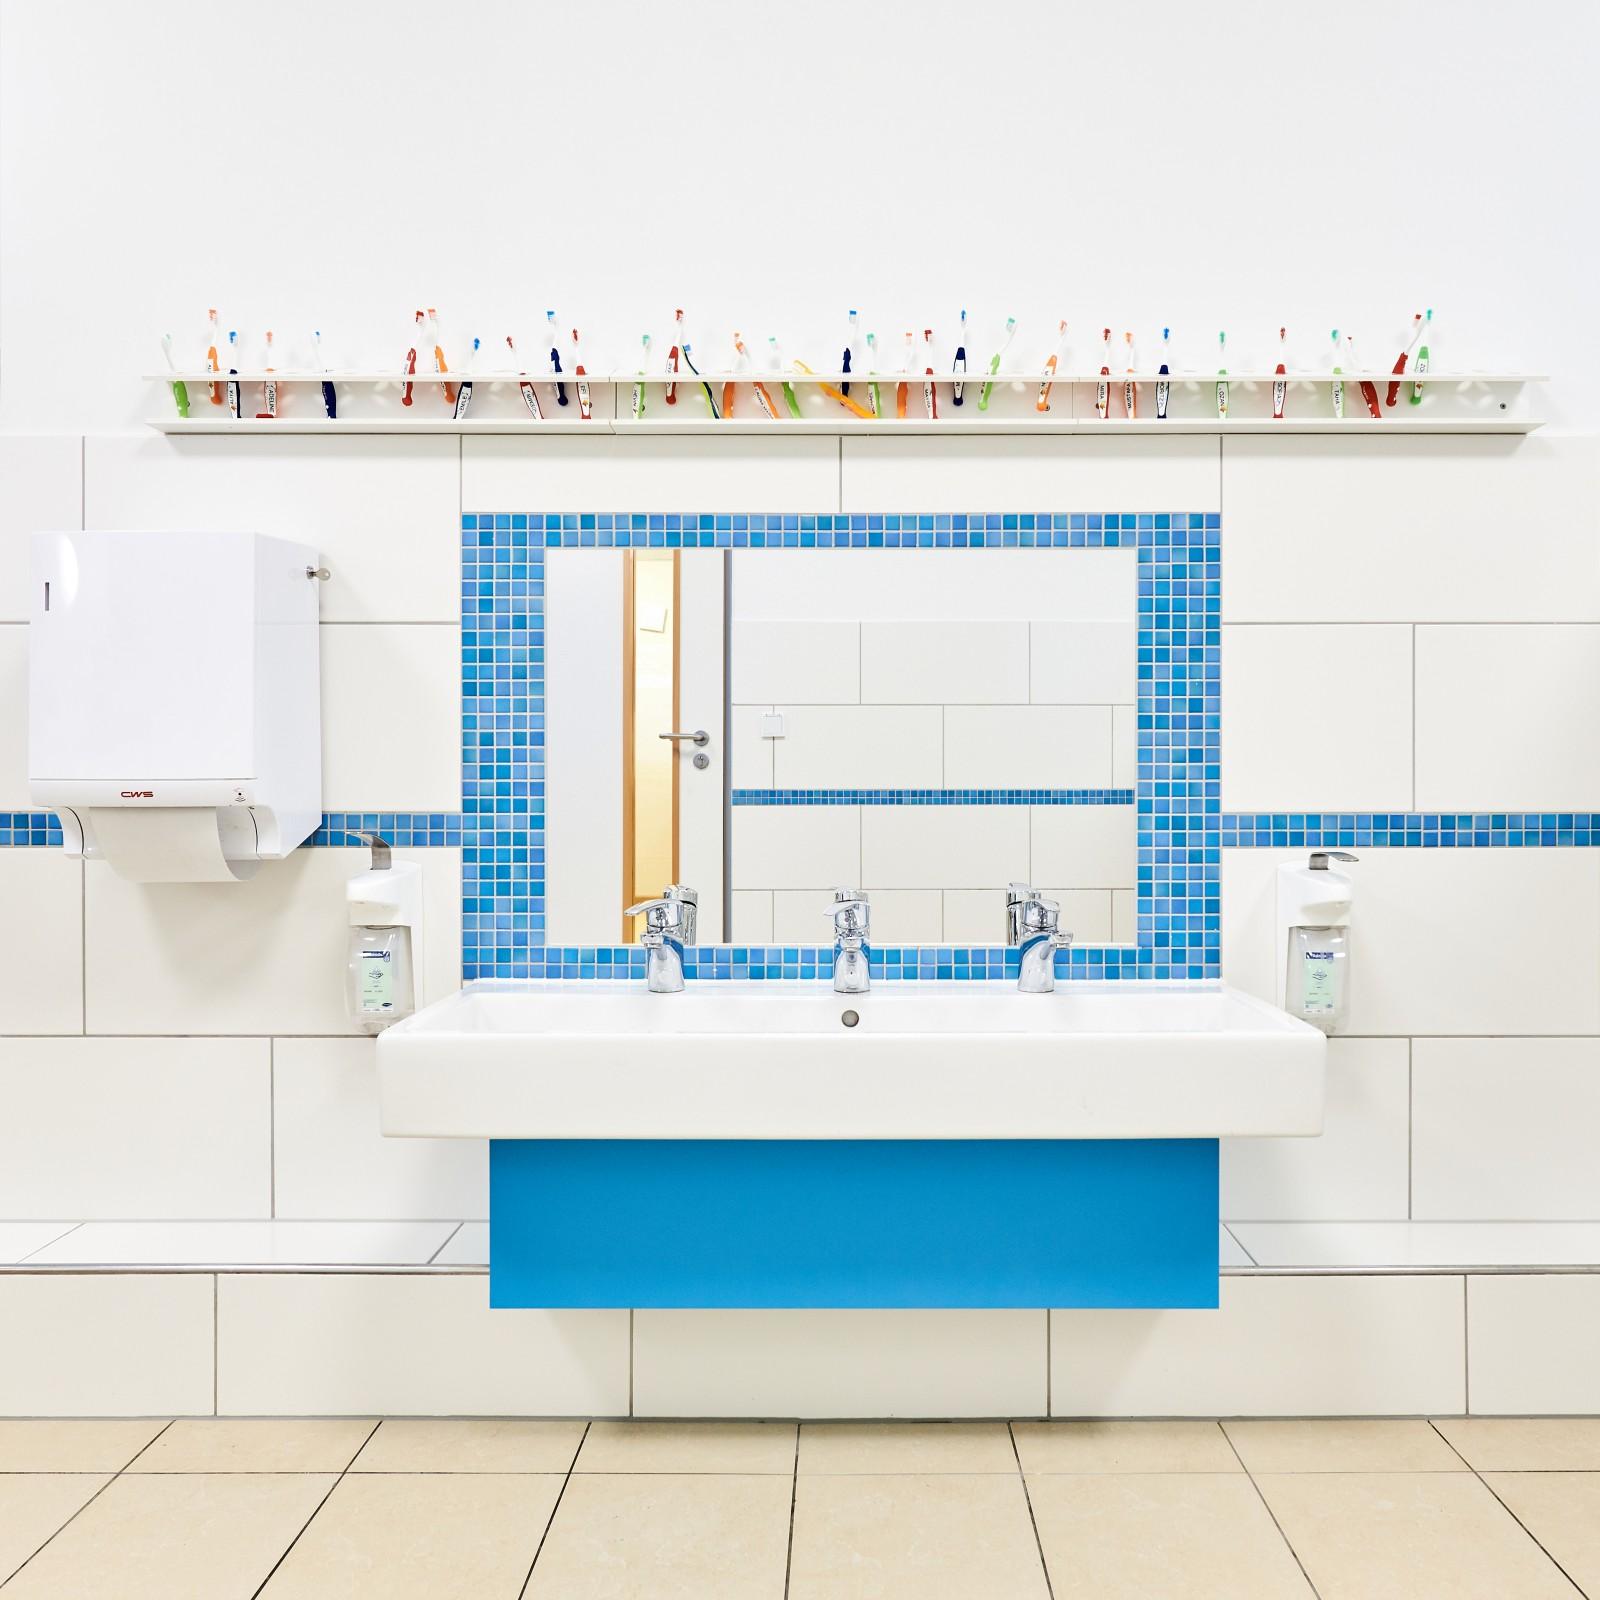 ausbau-kita-luettkamp-sanitaerbereich-blau